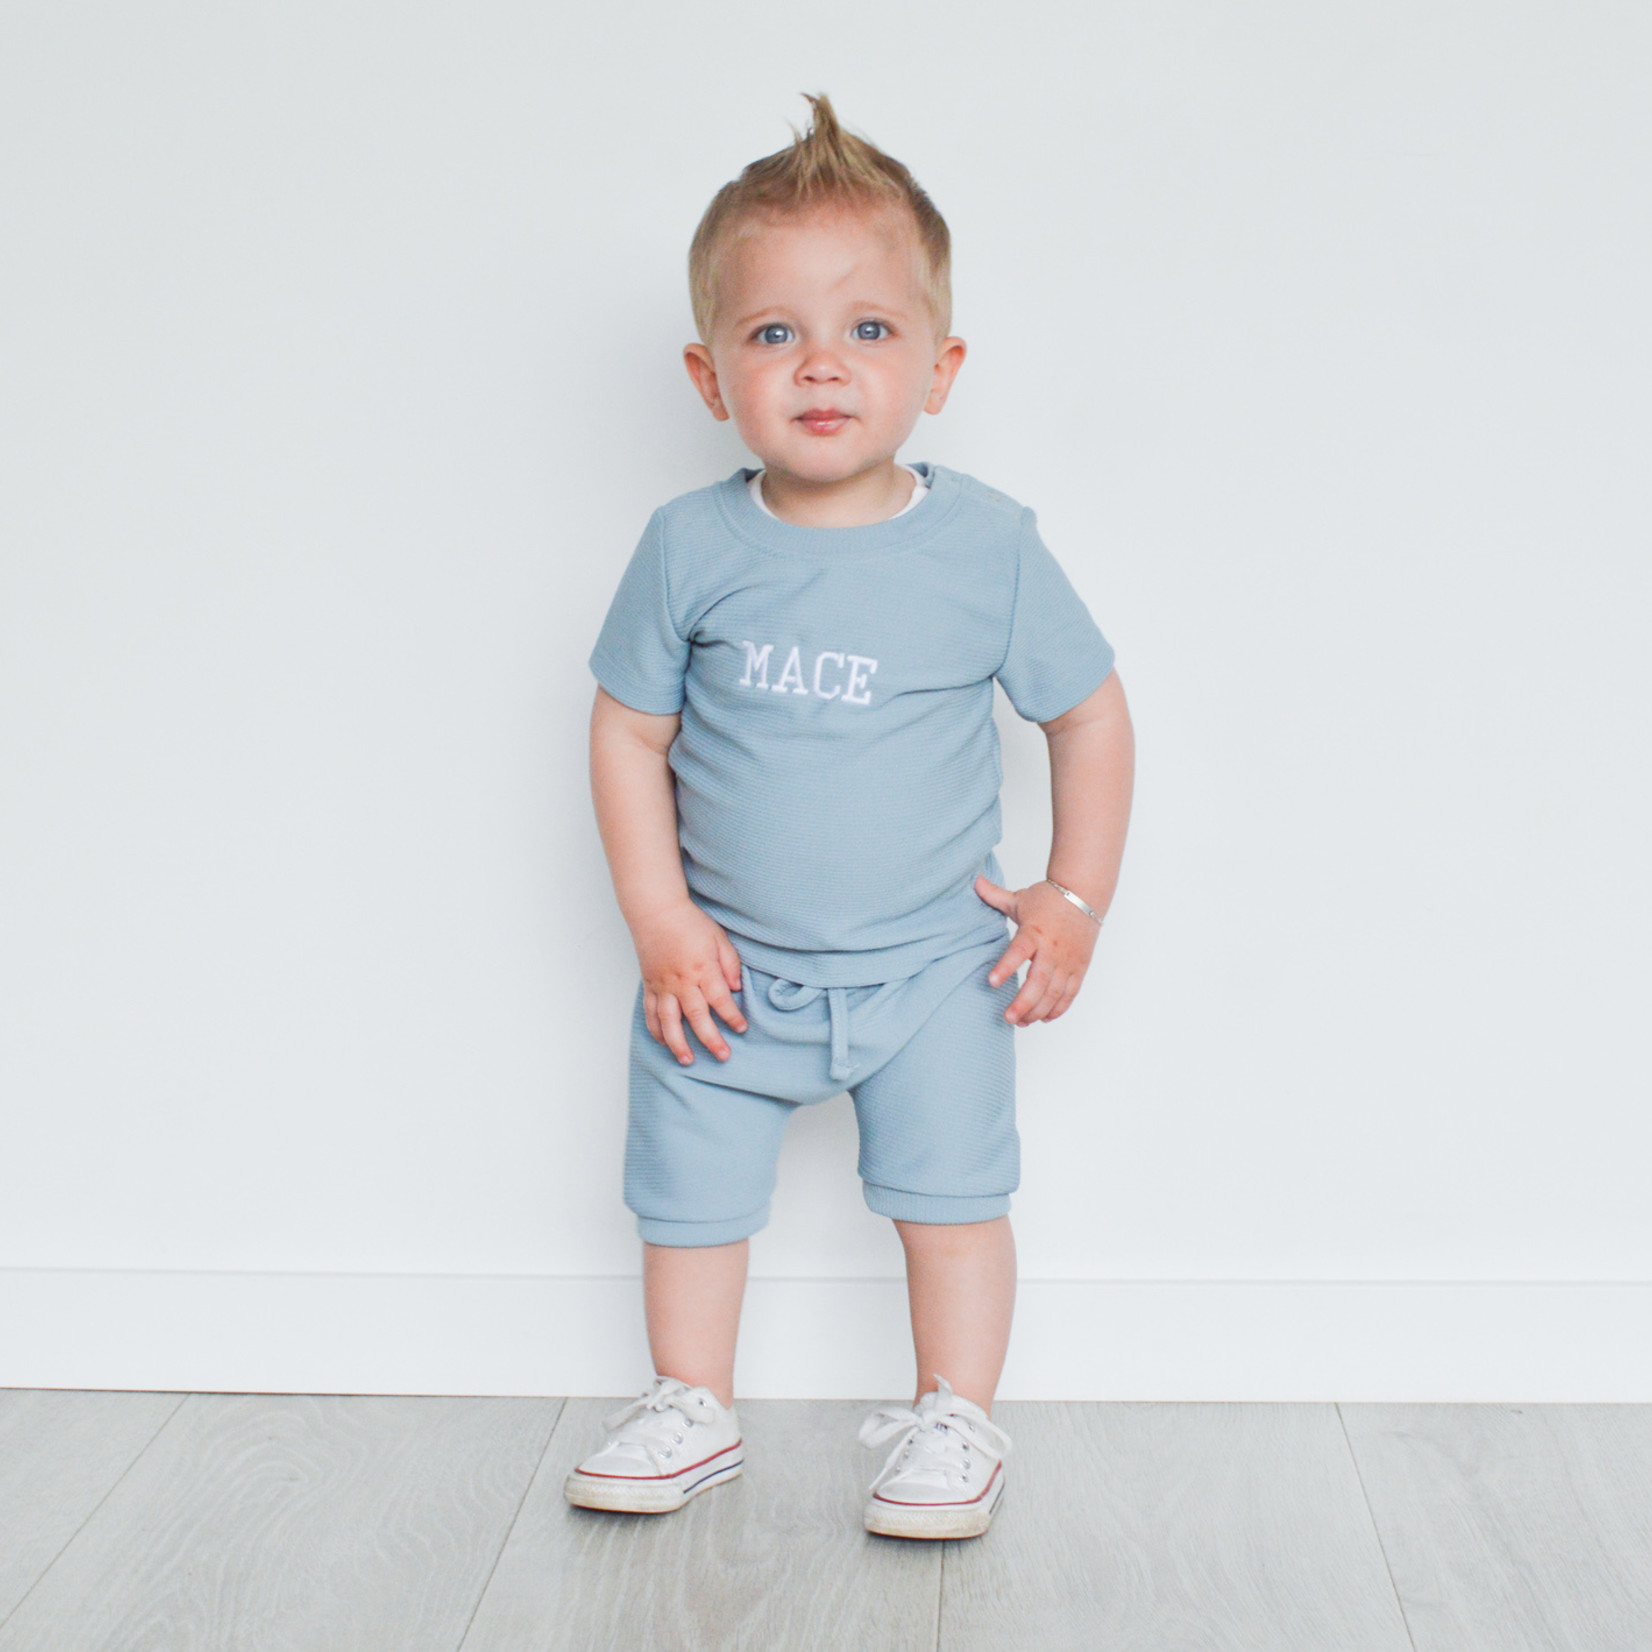 Fashion Kids  Blauw  rib geborduurd met naam  - Copy